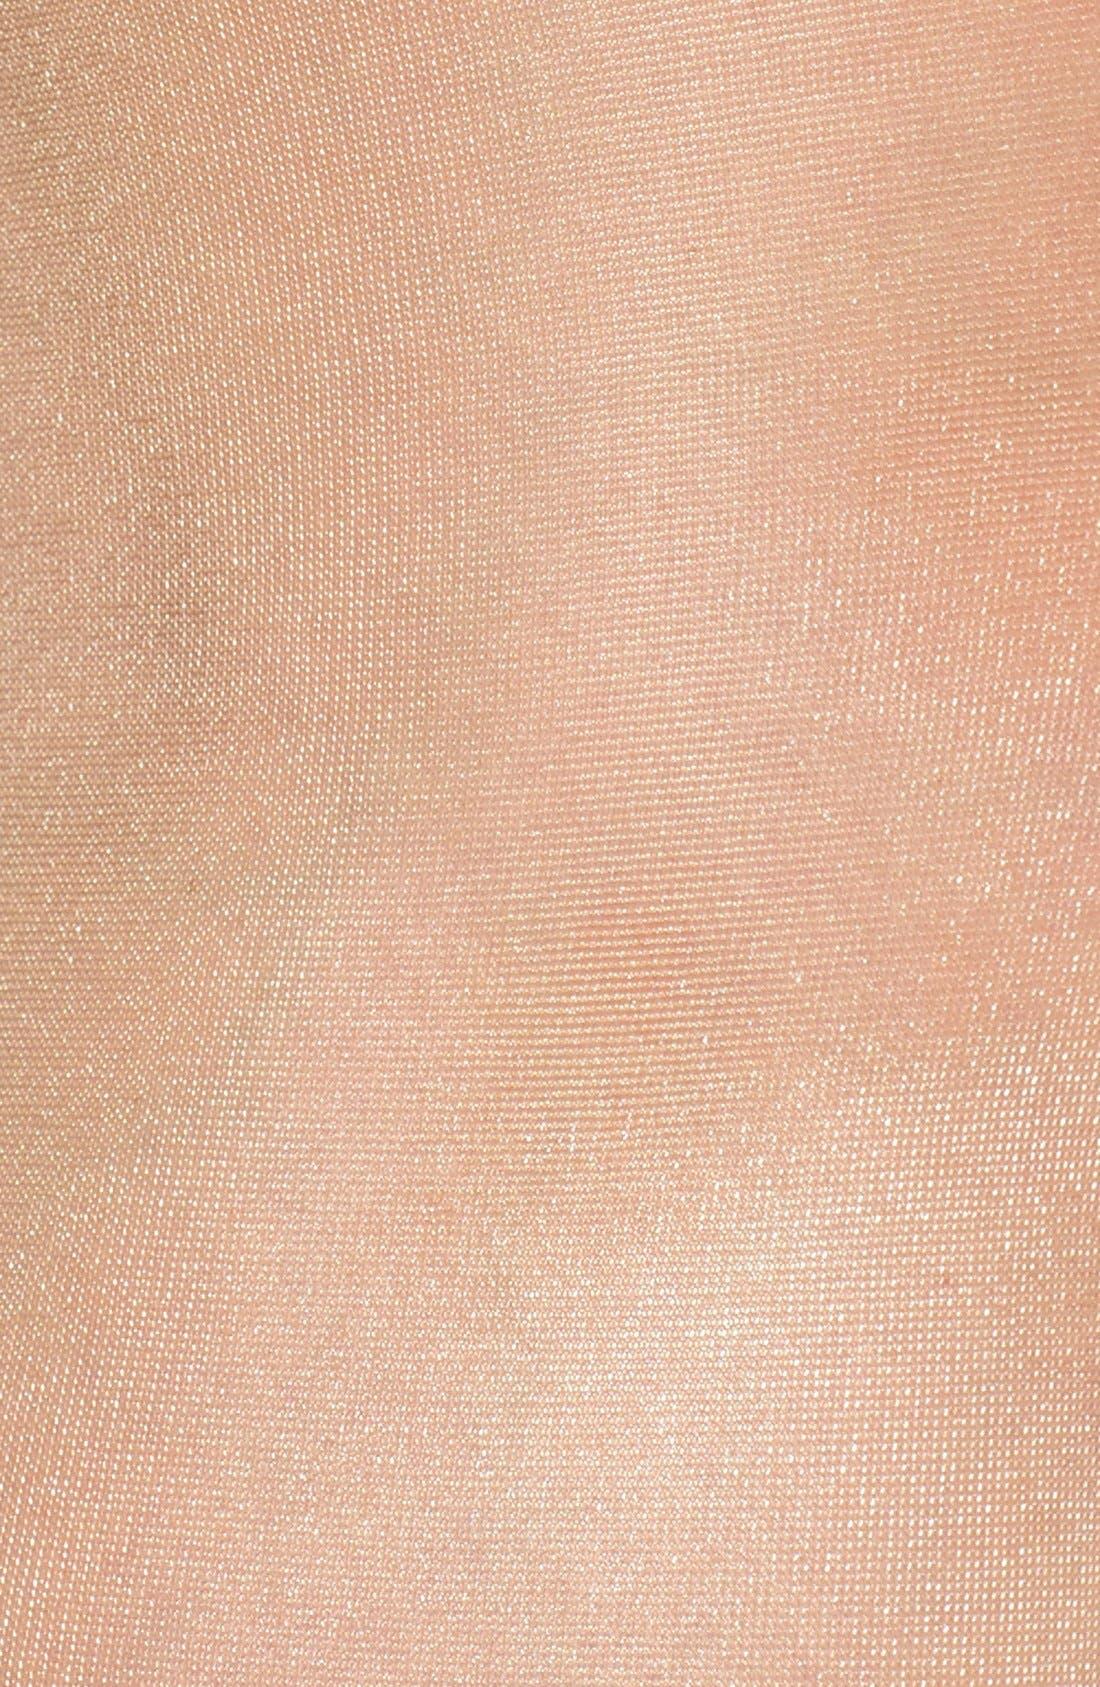 Alternate Image 2  - Falke 'Pure Shine 15 Denier' Stockings